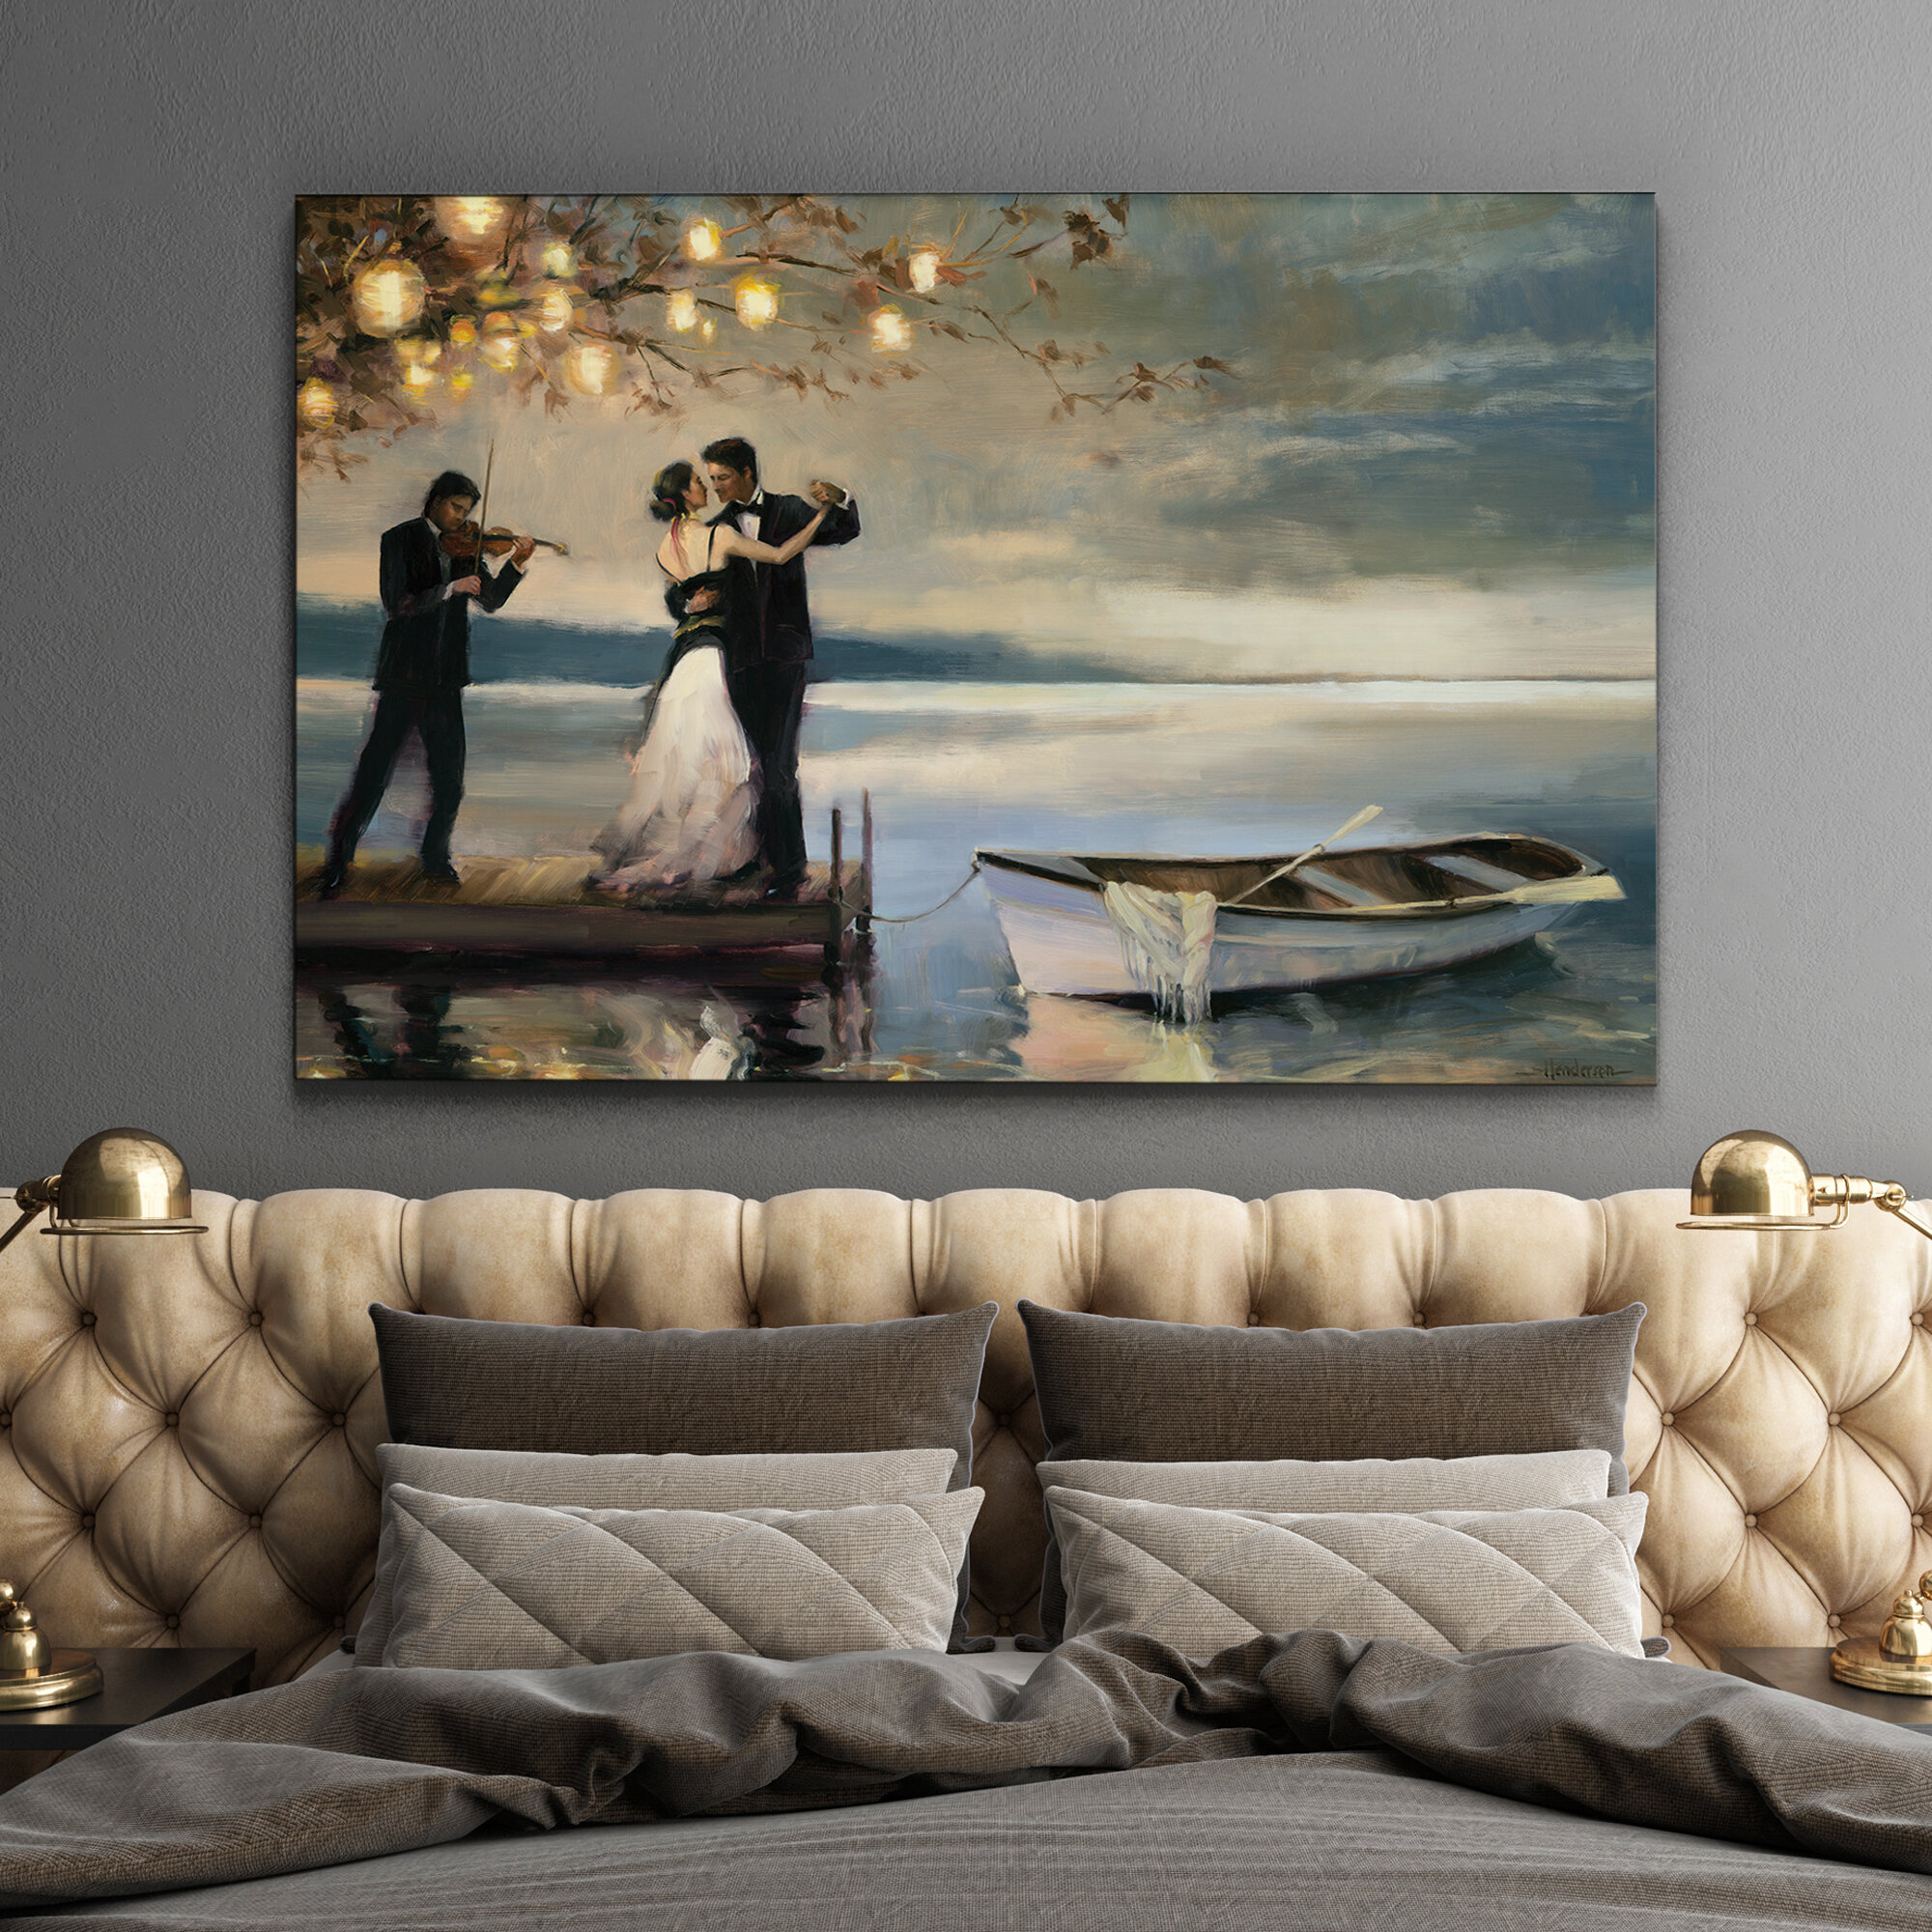 Heart Shaped Hook Love SINGLE CANVAS WALL ART Picture Print VA